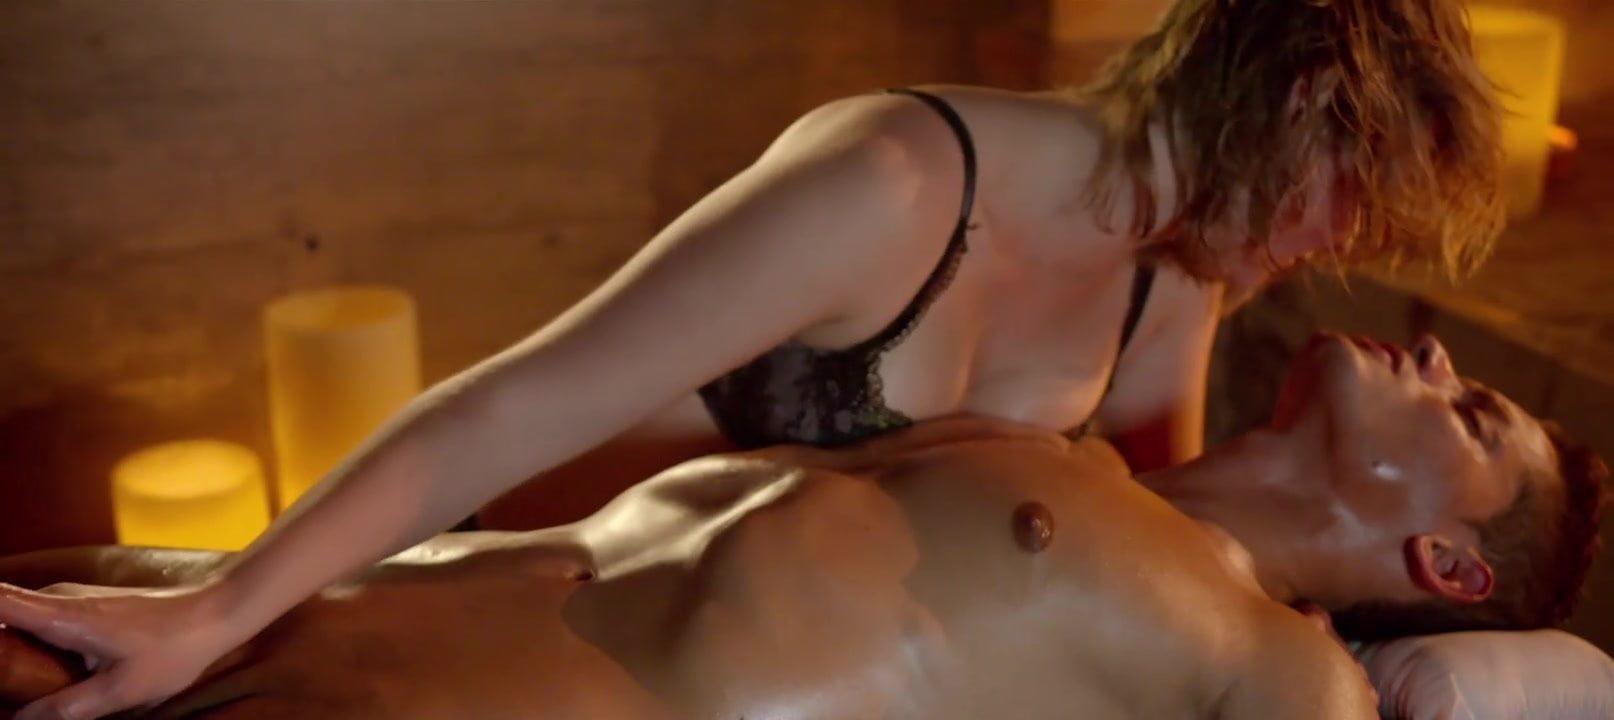 Cumming on my fav bbws sexy hairy pussy 98%